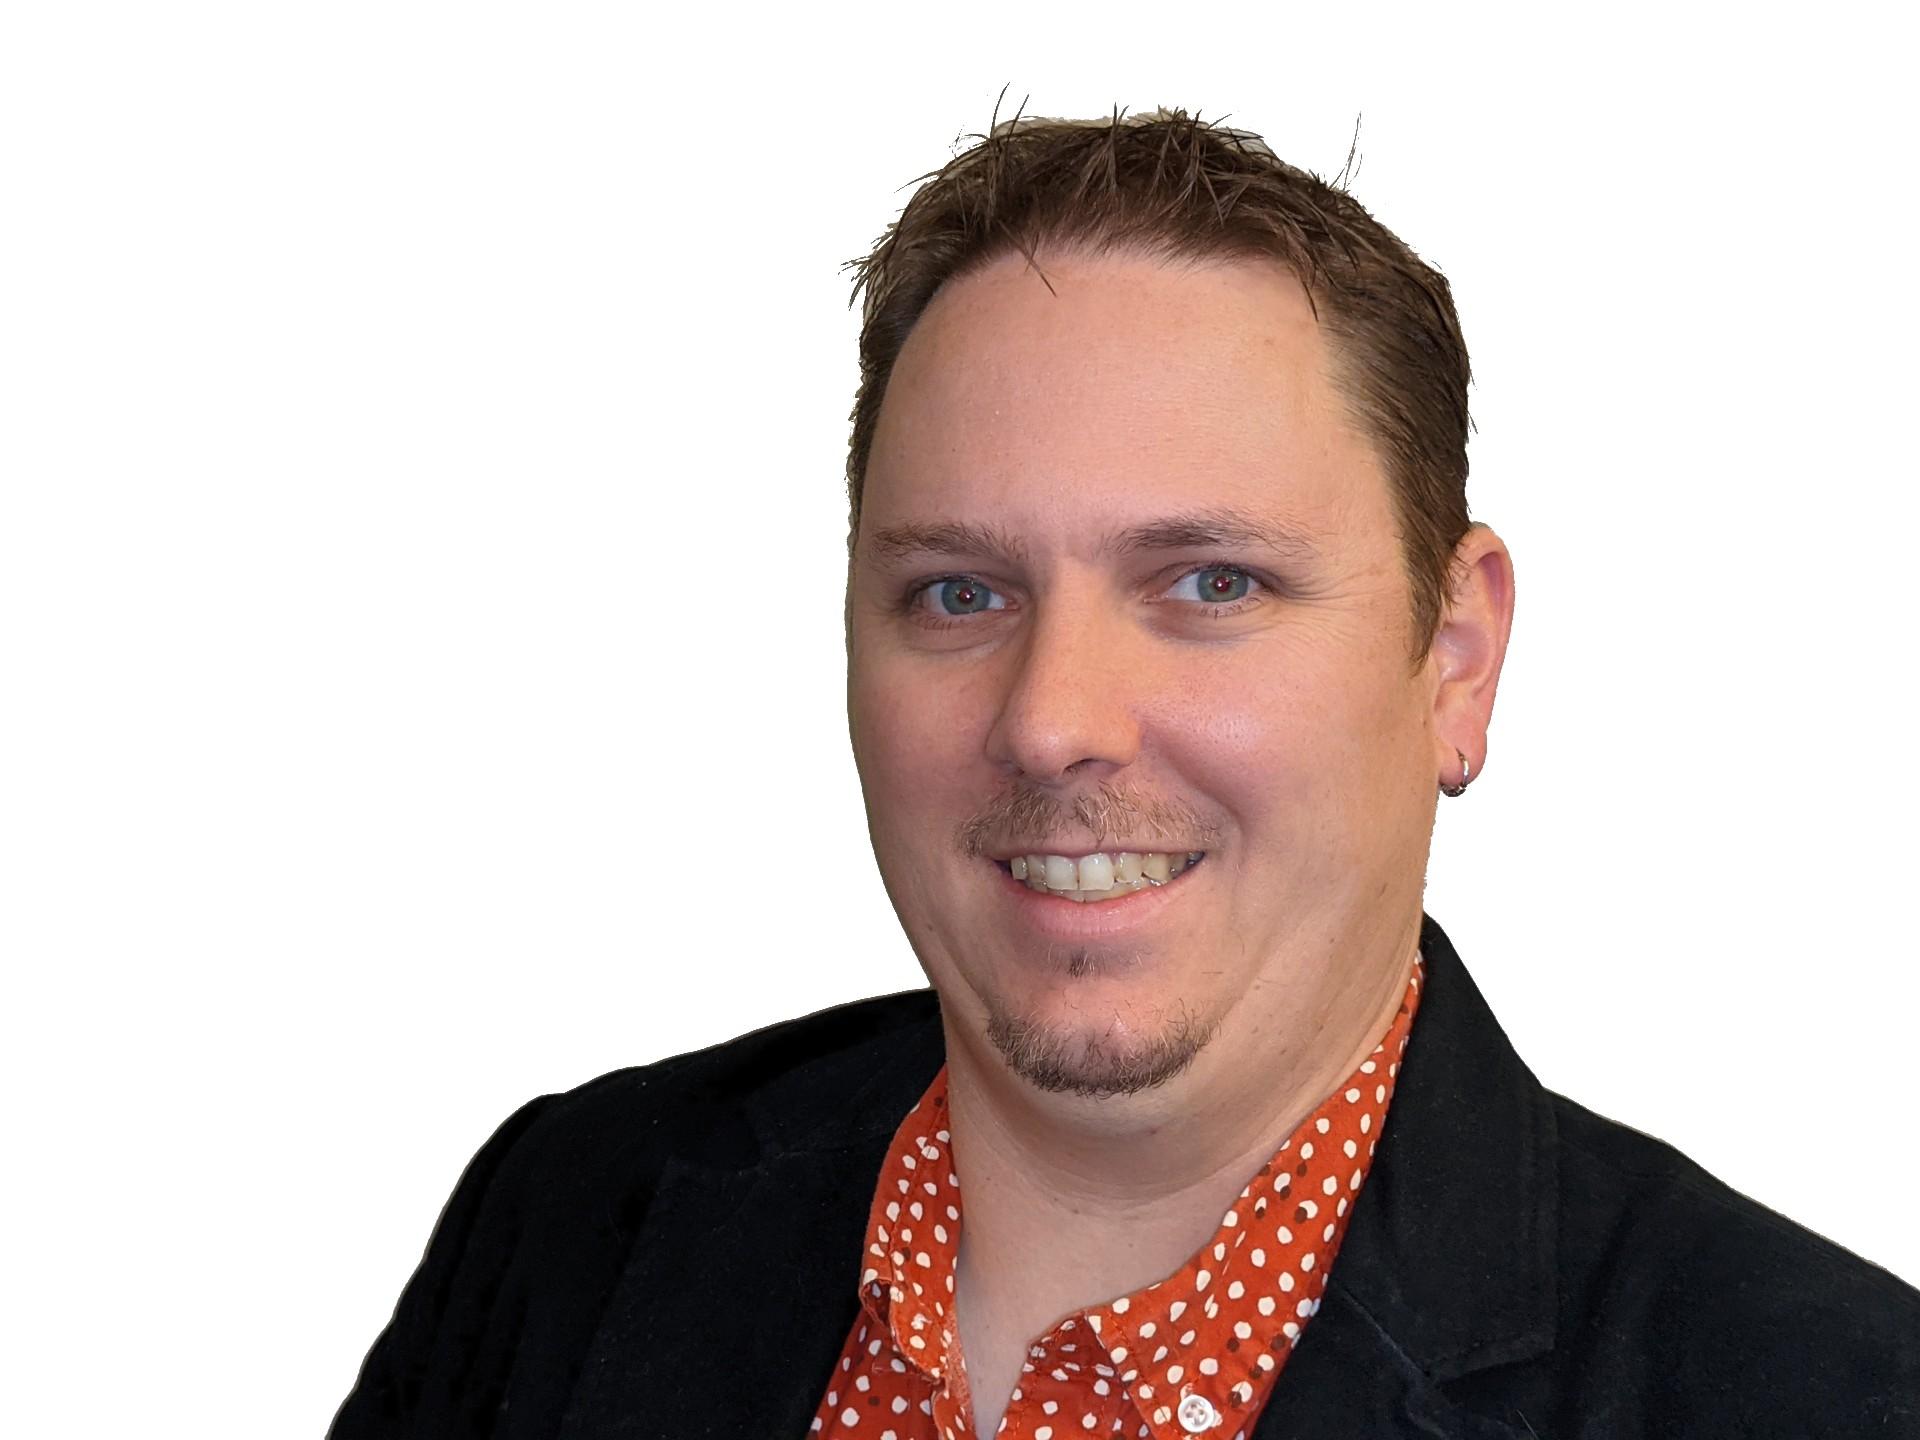 Gavin Foster